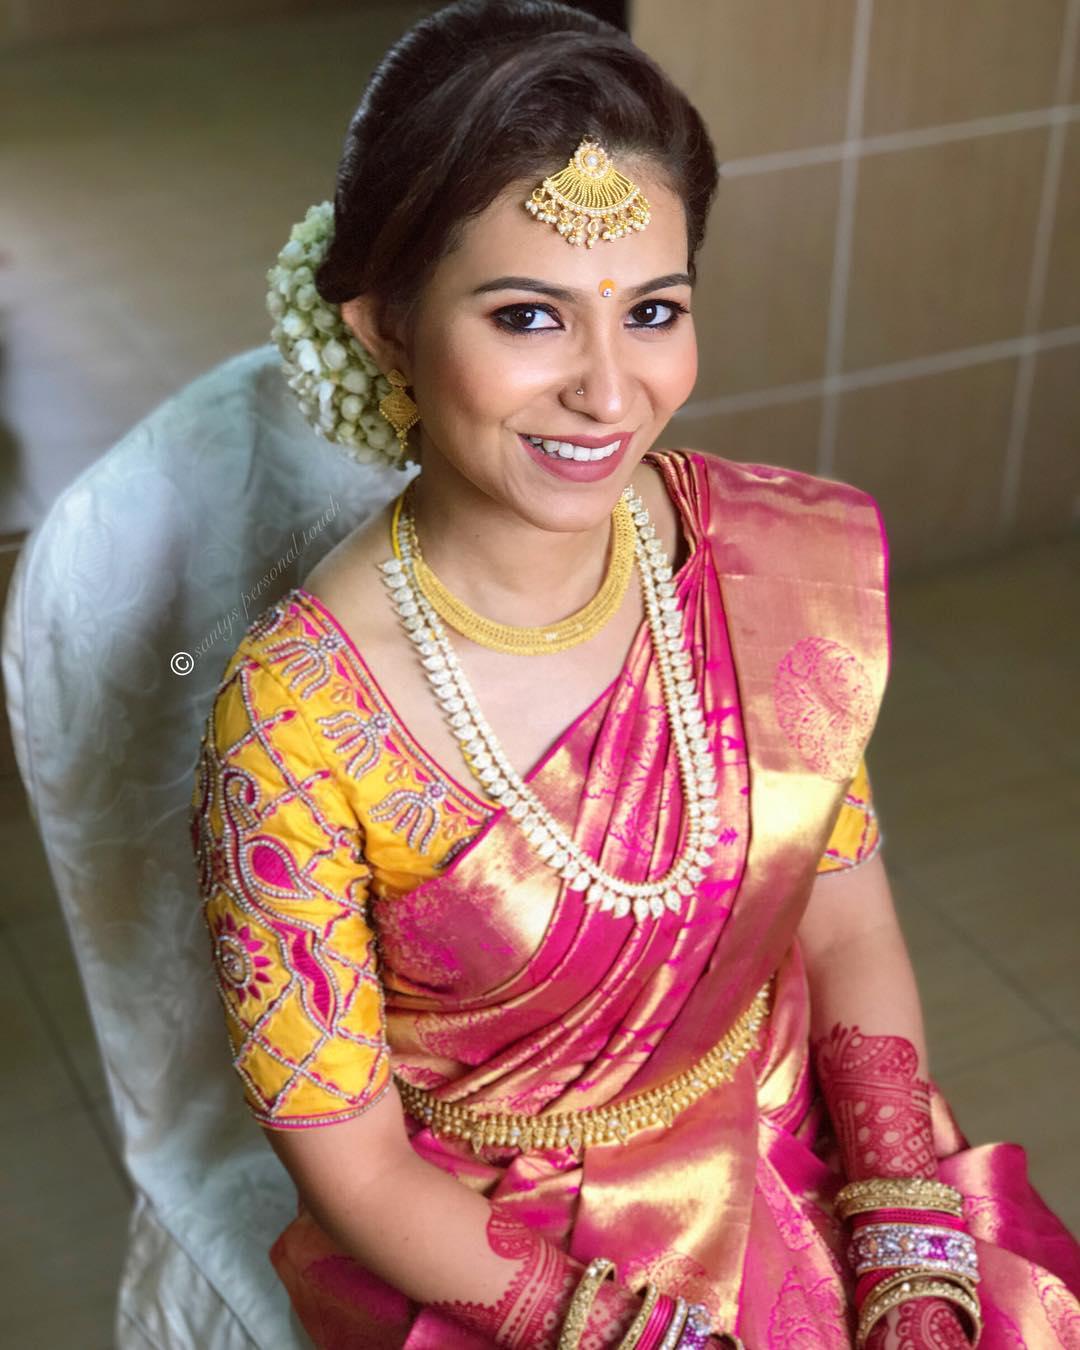 half chaandbali gold maang tikka on South Indian bride